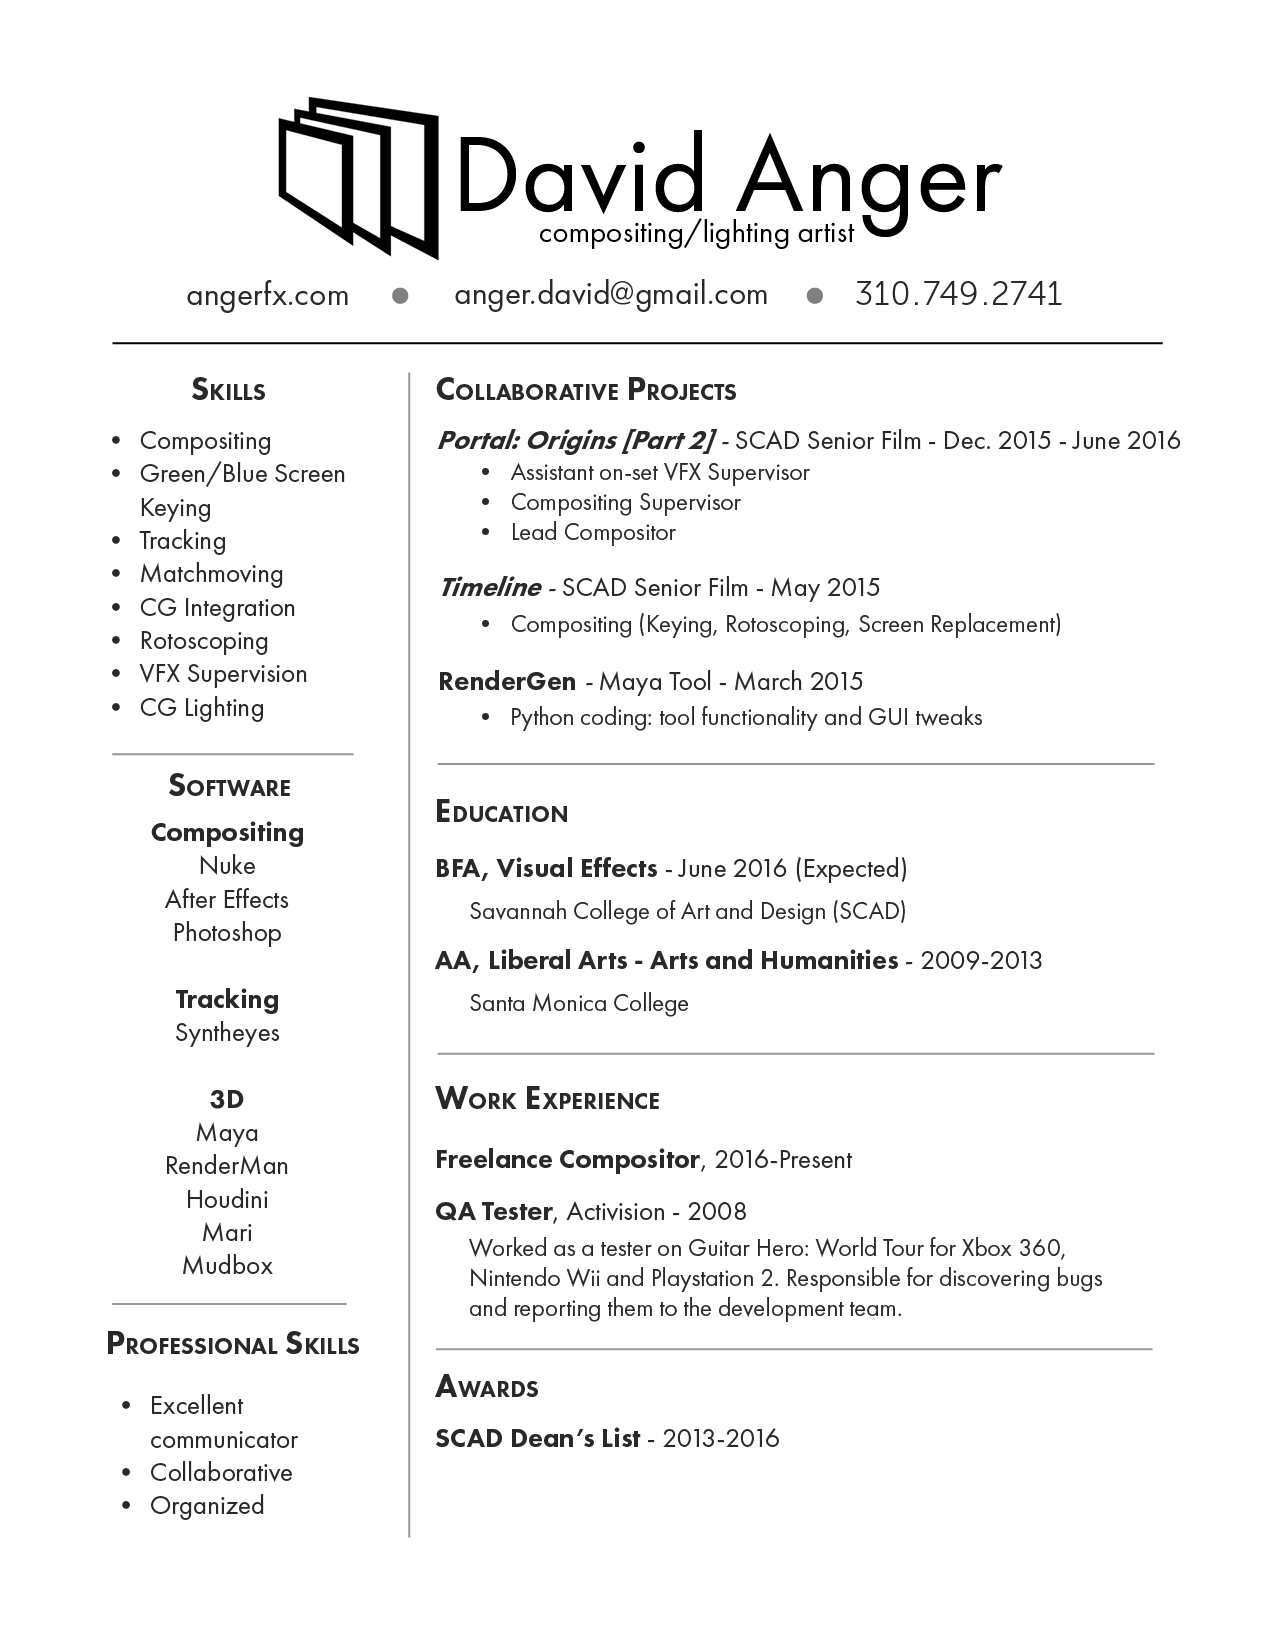 Resume David Anger